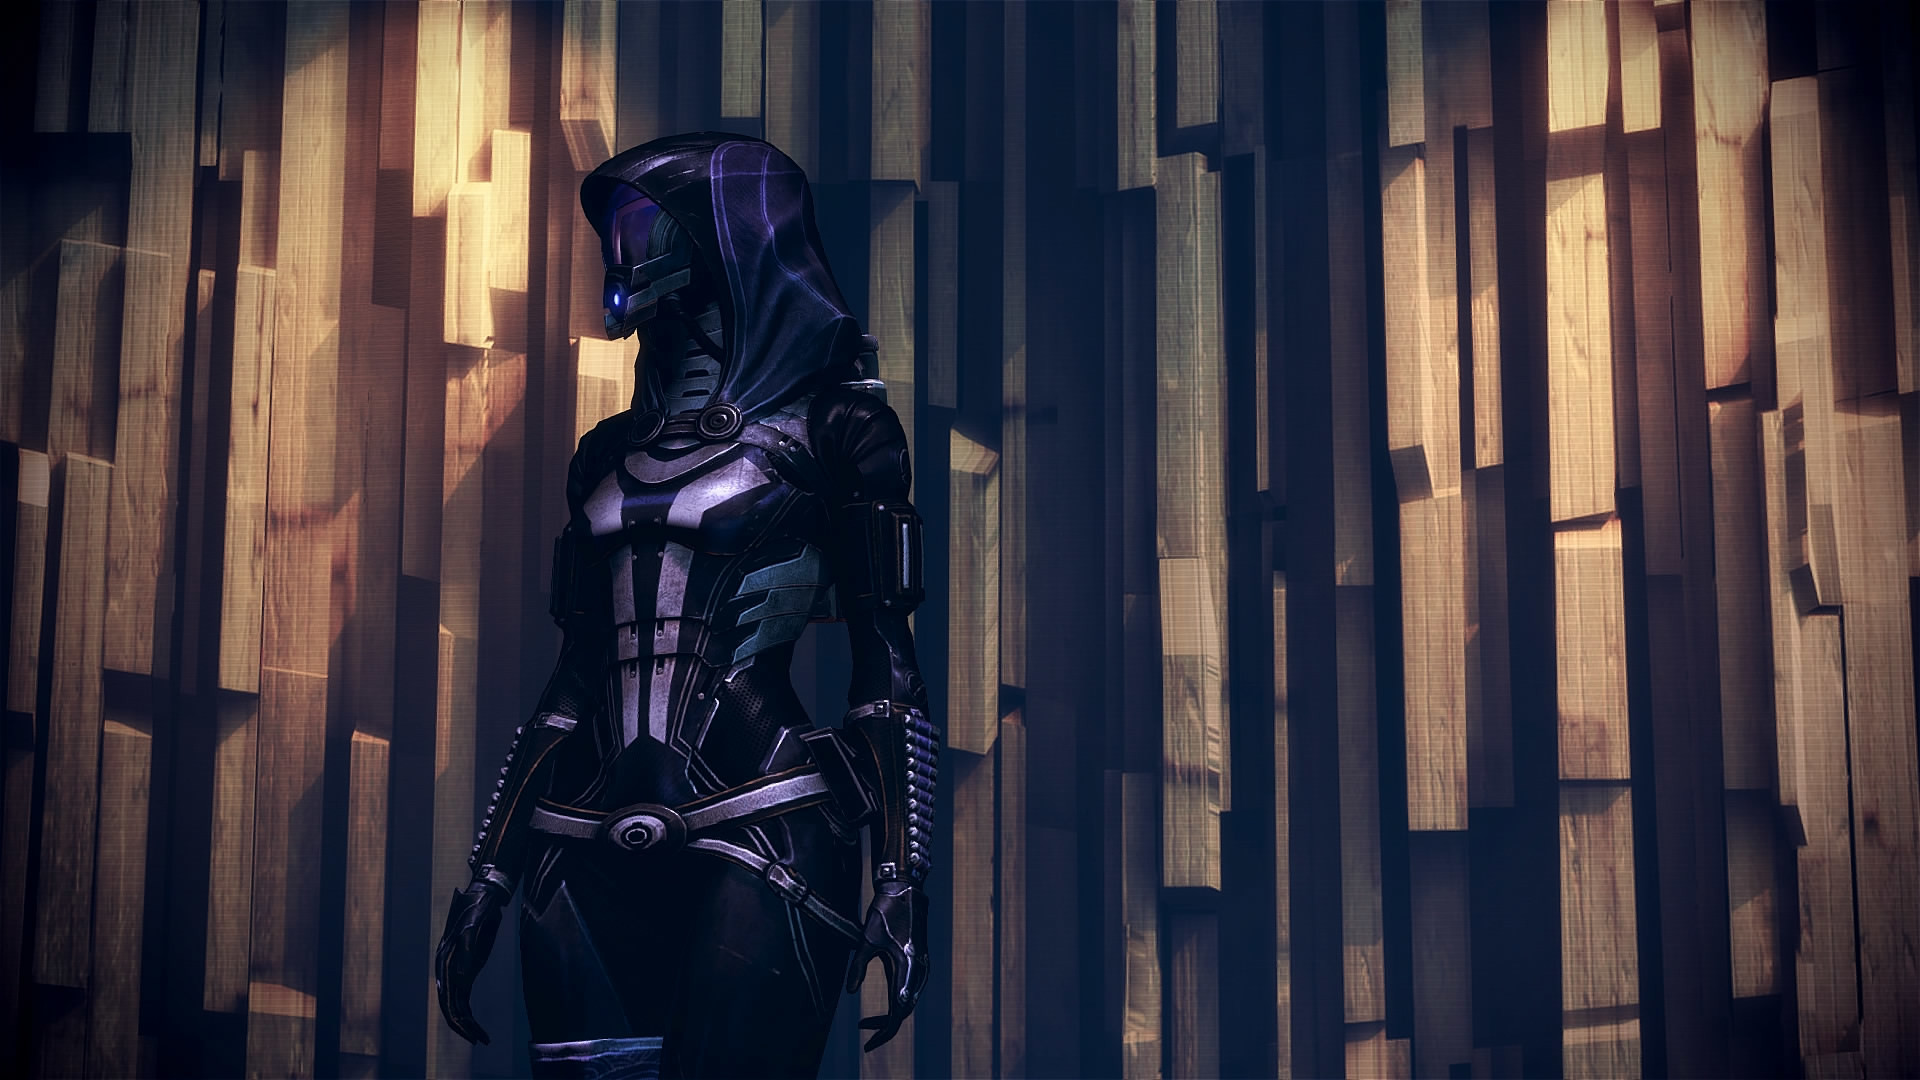 … Mass Effect 3 Tali Custom Wall Dreamscene by droot1986